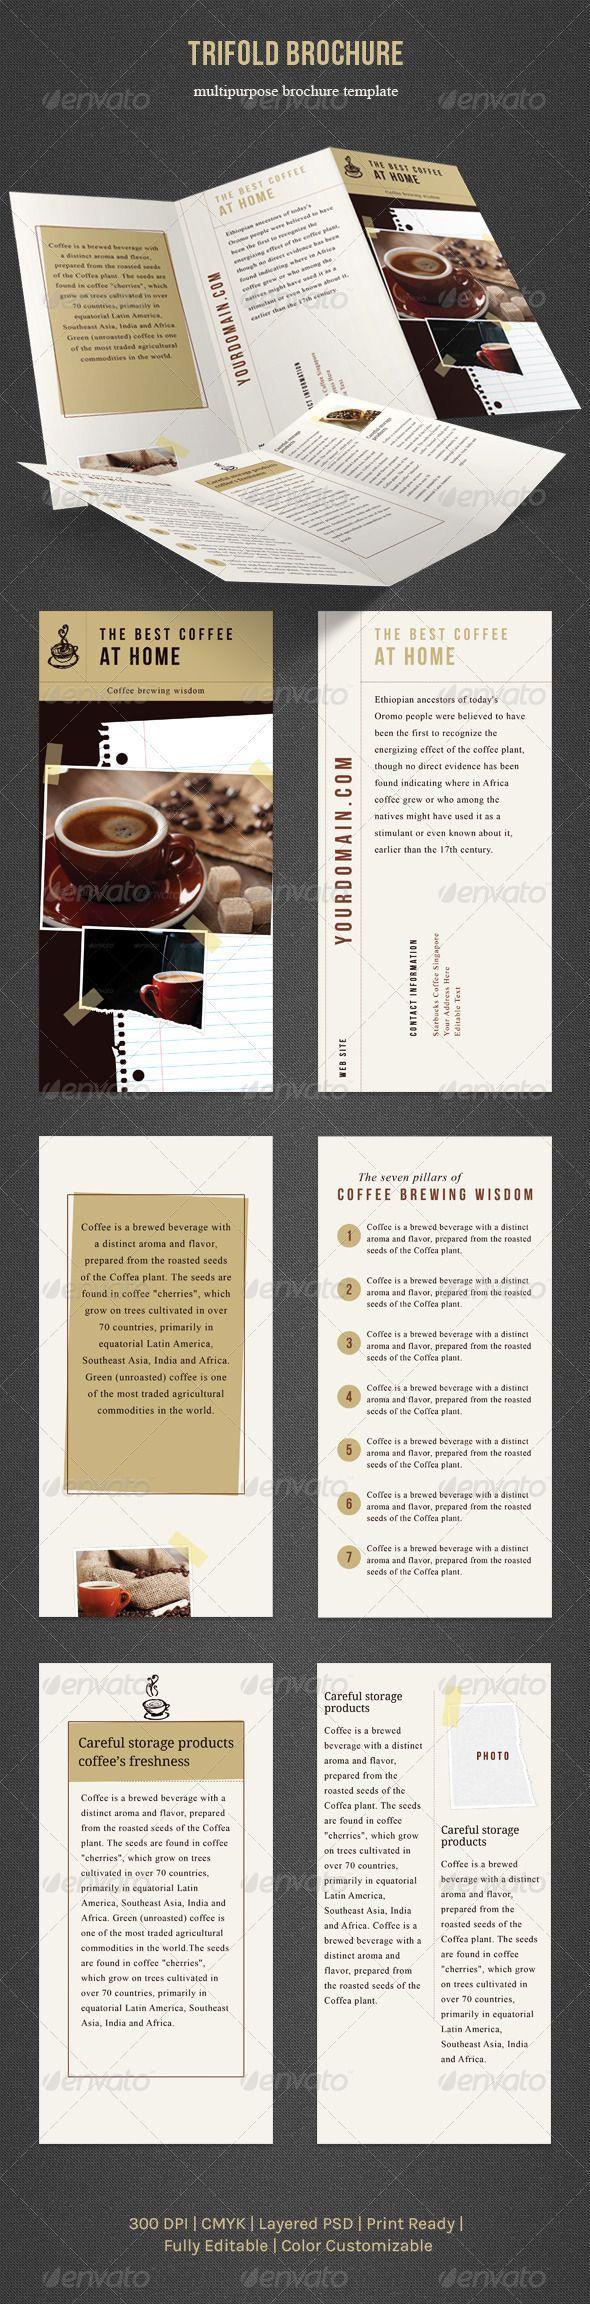 Print Templates Trifold Brochure